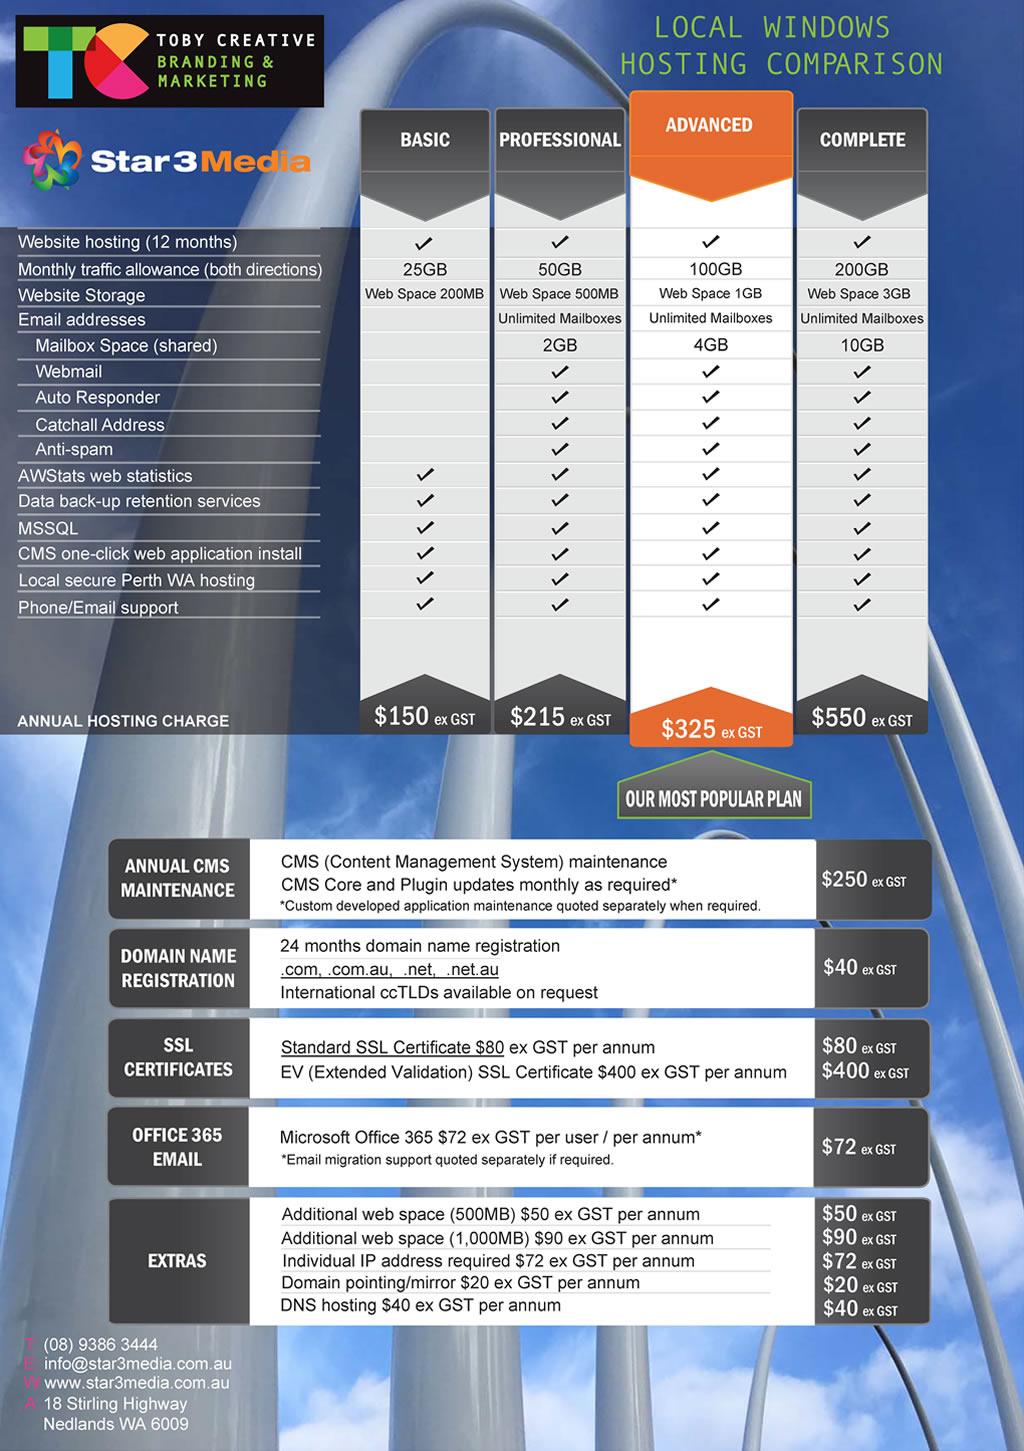 Toby Creative – Perth Windows Cheap Website Hosting Prices Windows Hosting Comparison Plan